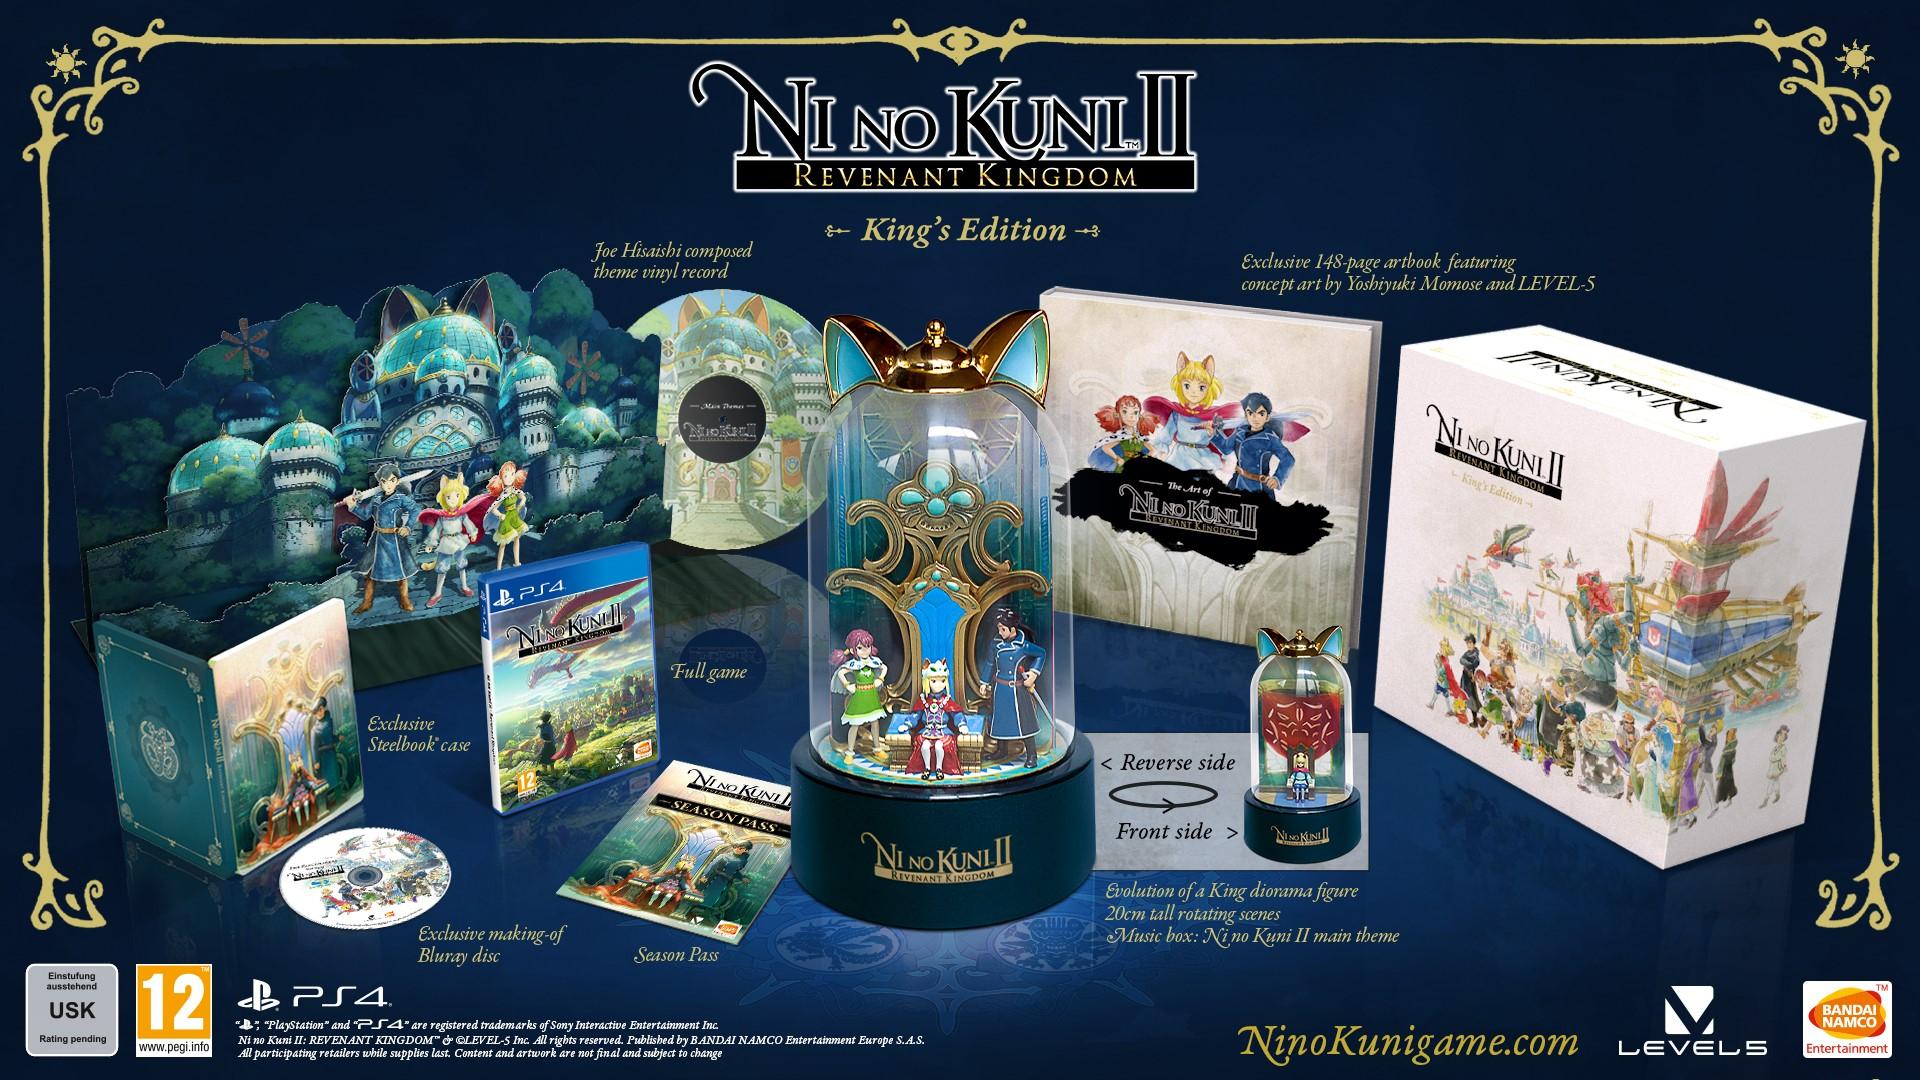 Ni No Kuni II: Revenant Kingdom King's Edition (PS4) - £114.99 @ Grainger Games